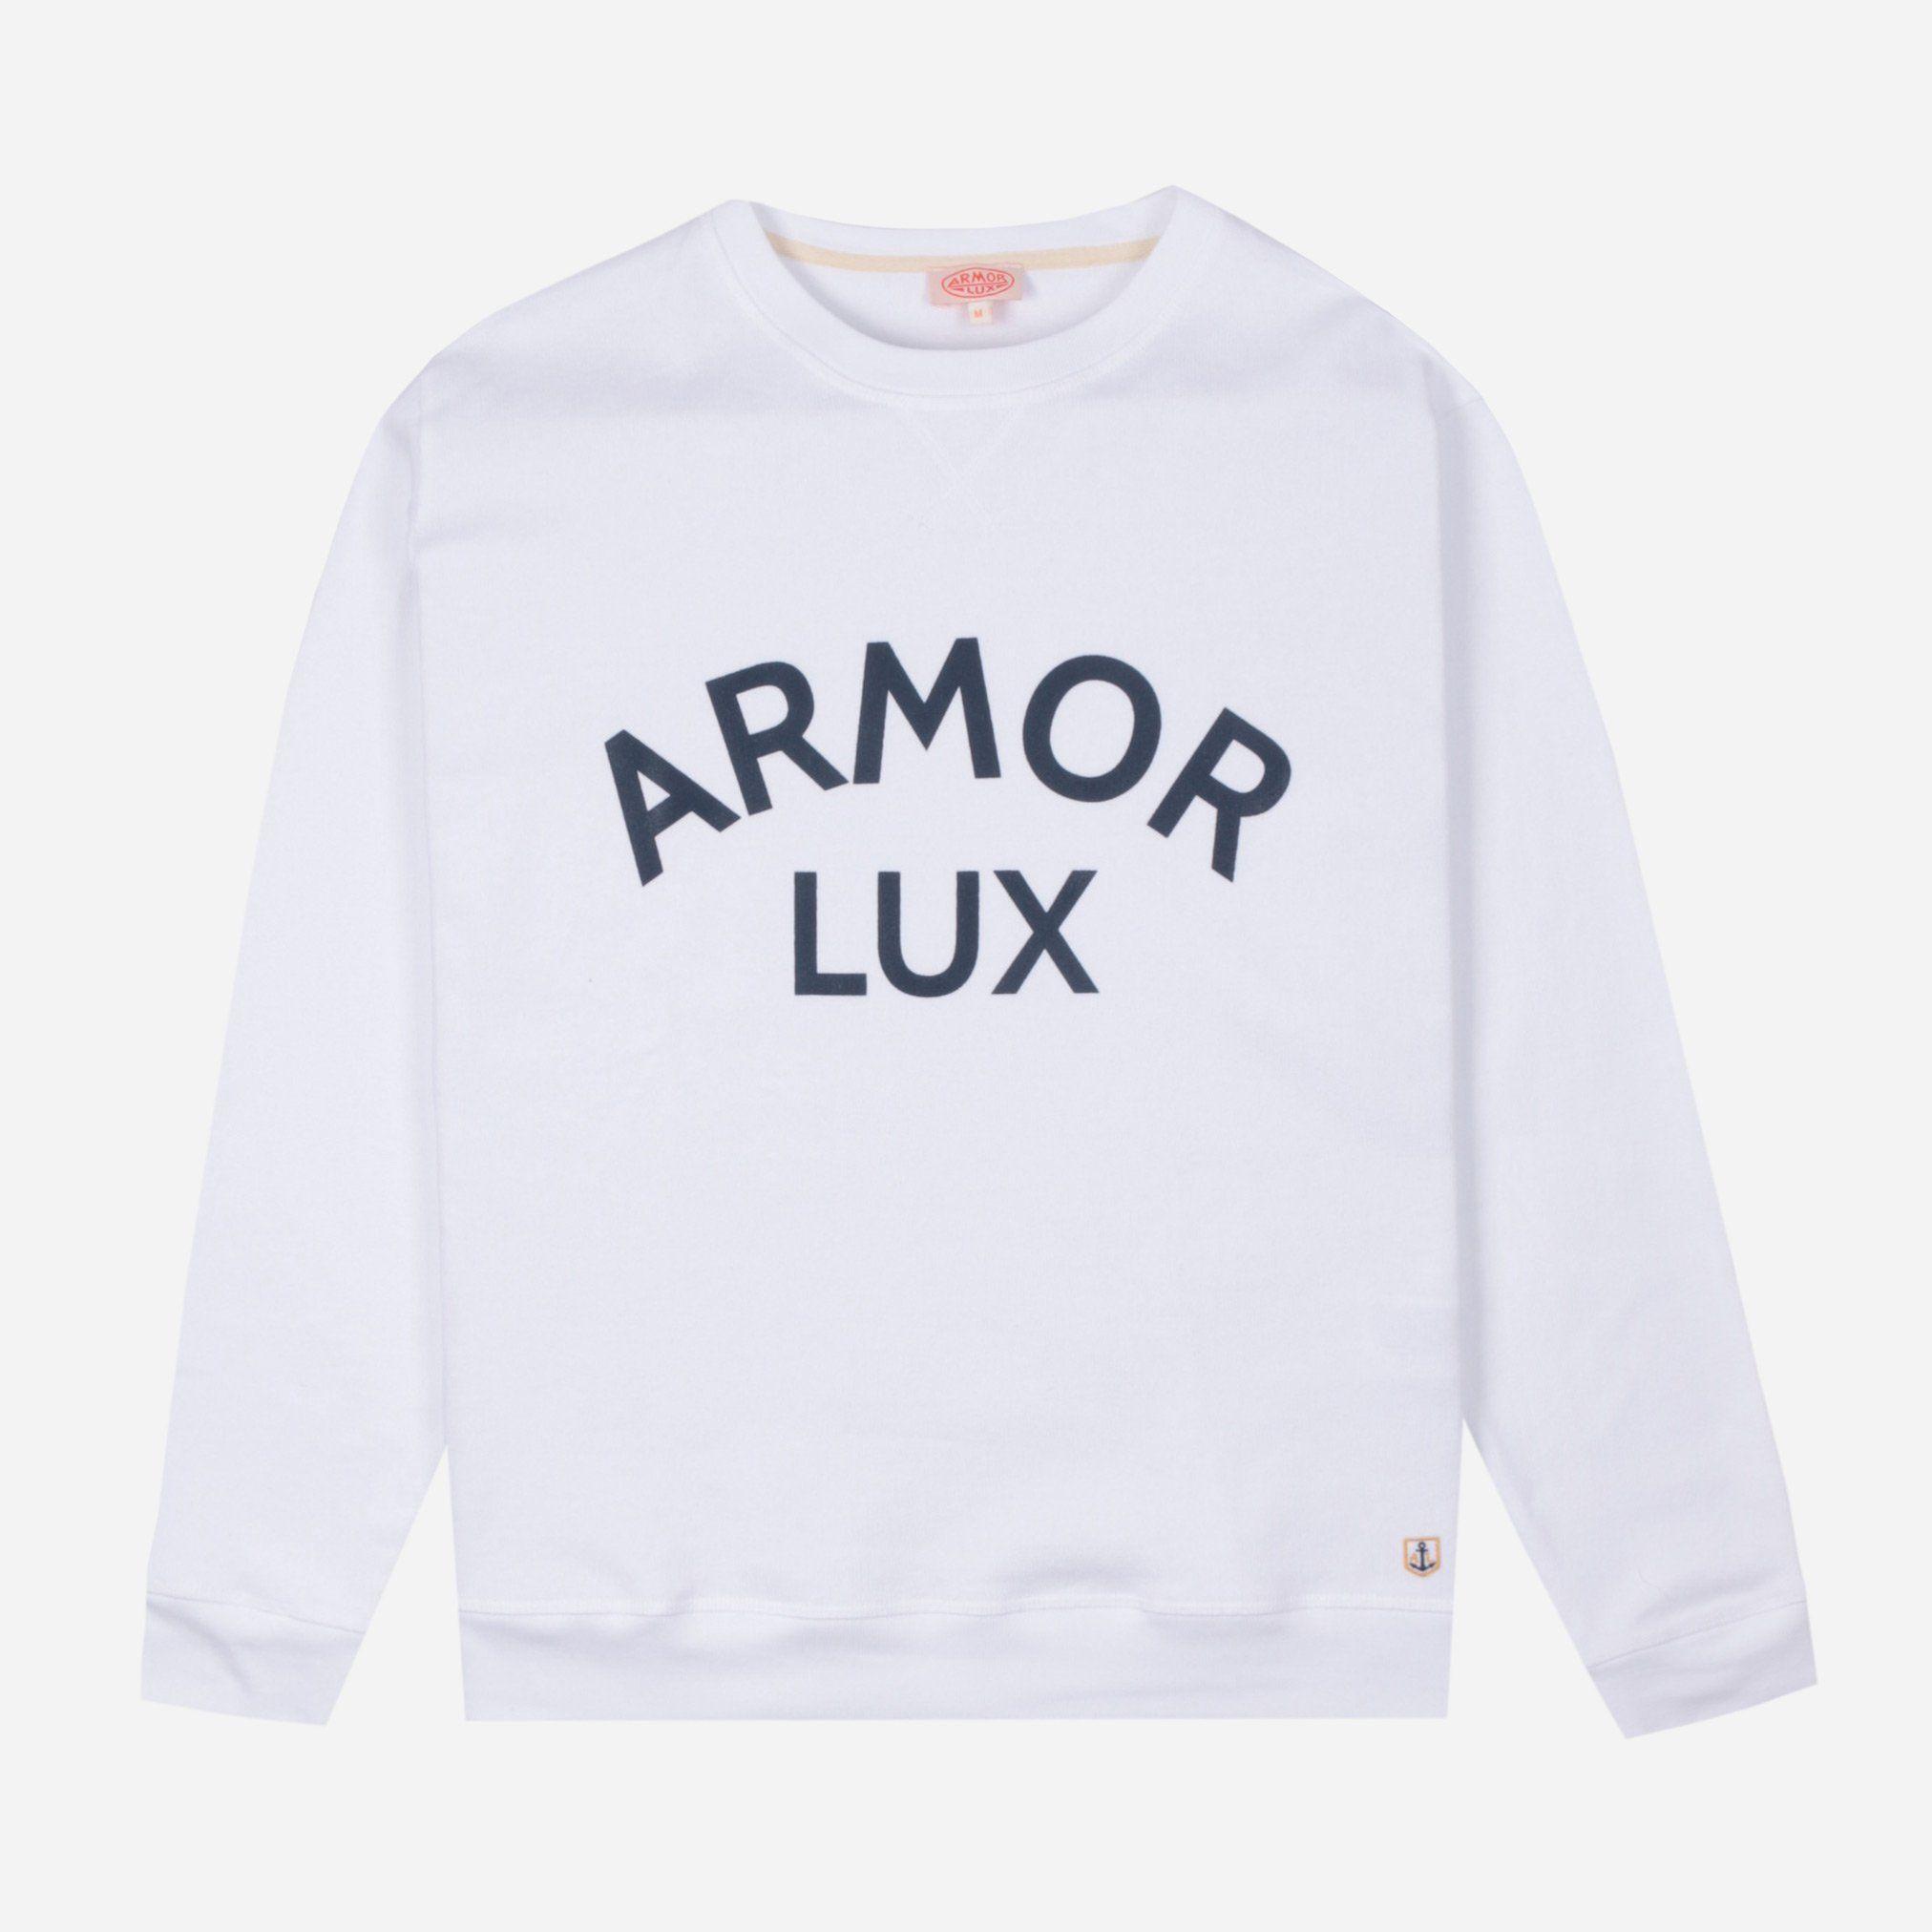 Armor Lux #76661 SWEAT HERITAGE